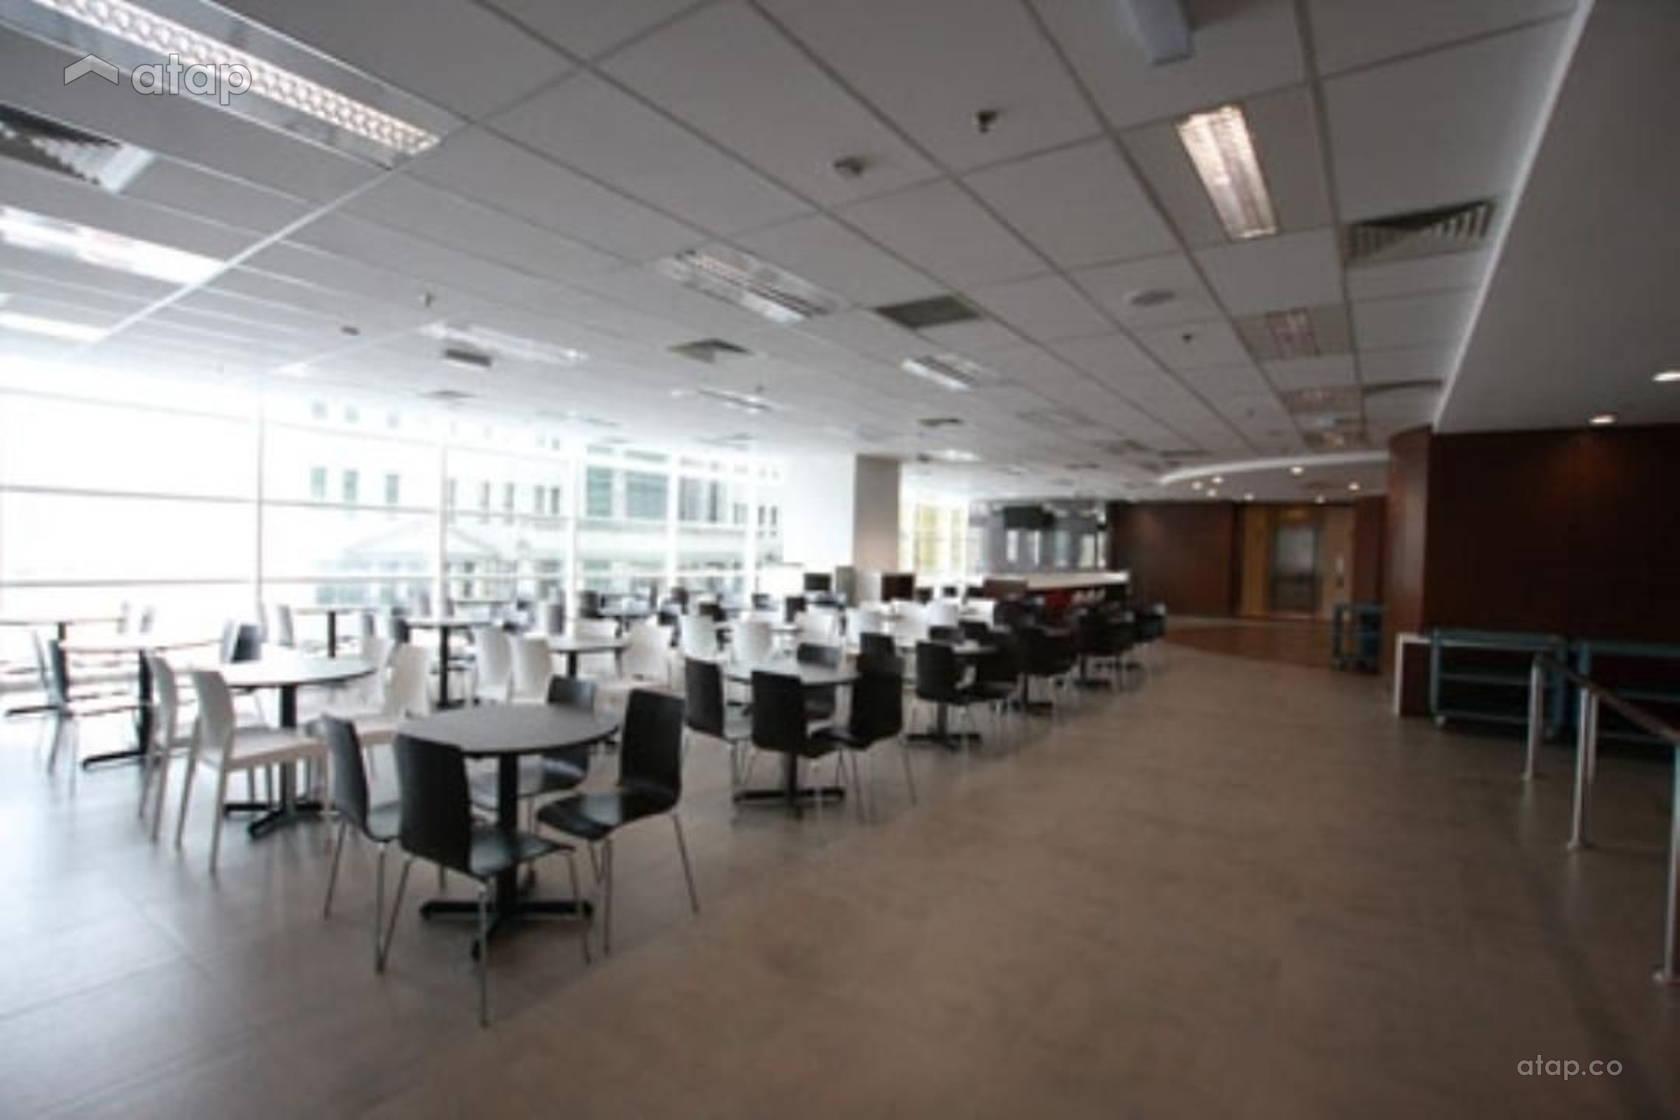 menara hsbc north tower interior design renovation ideas photos 1 10